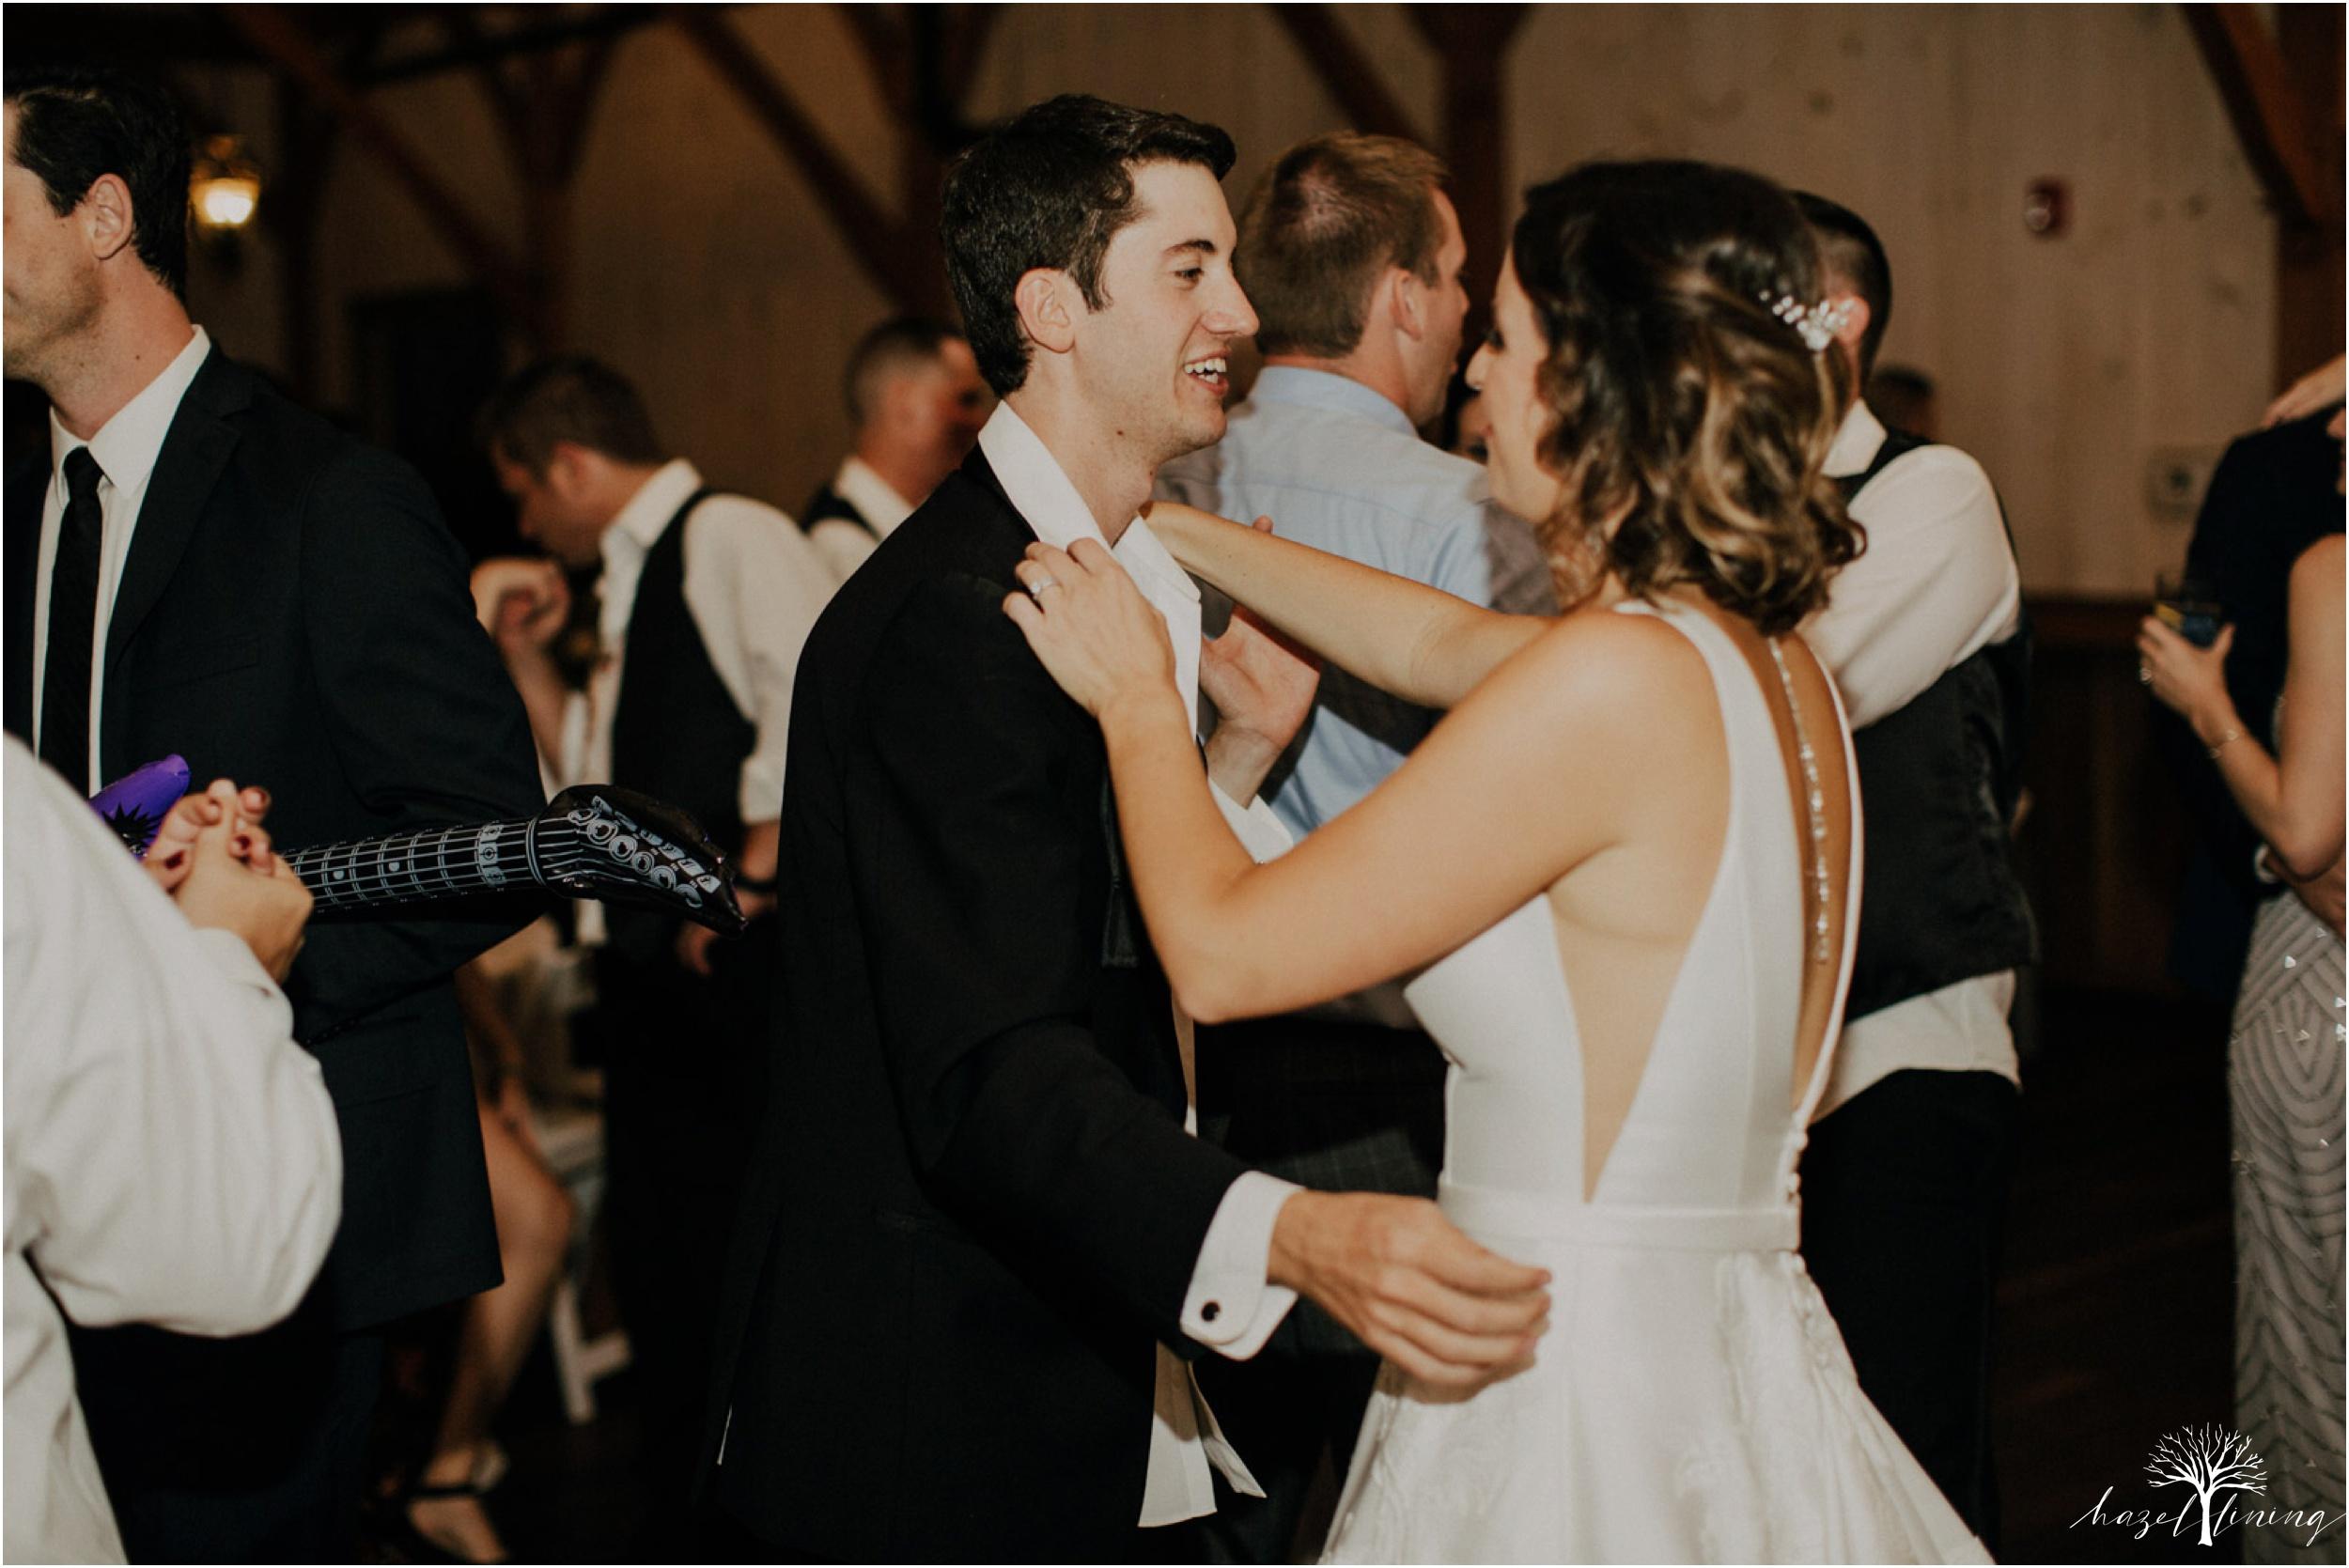 maureen-hepner-anthony-giordano-rose-bank-winery-newtow-pennsylvania-luxury-summer-wedding-hazel-lining-photography-destination-elopement-wedding-engagement-photography_0151.jpg